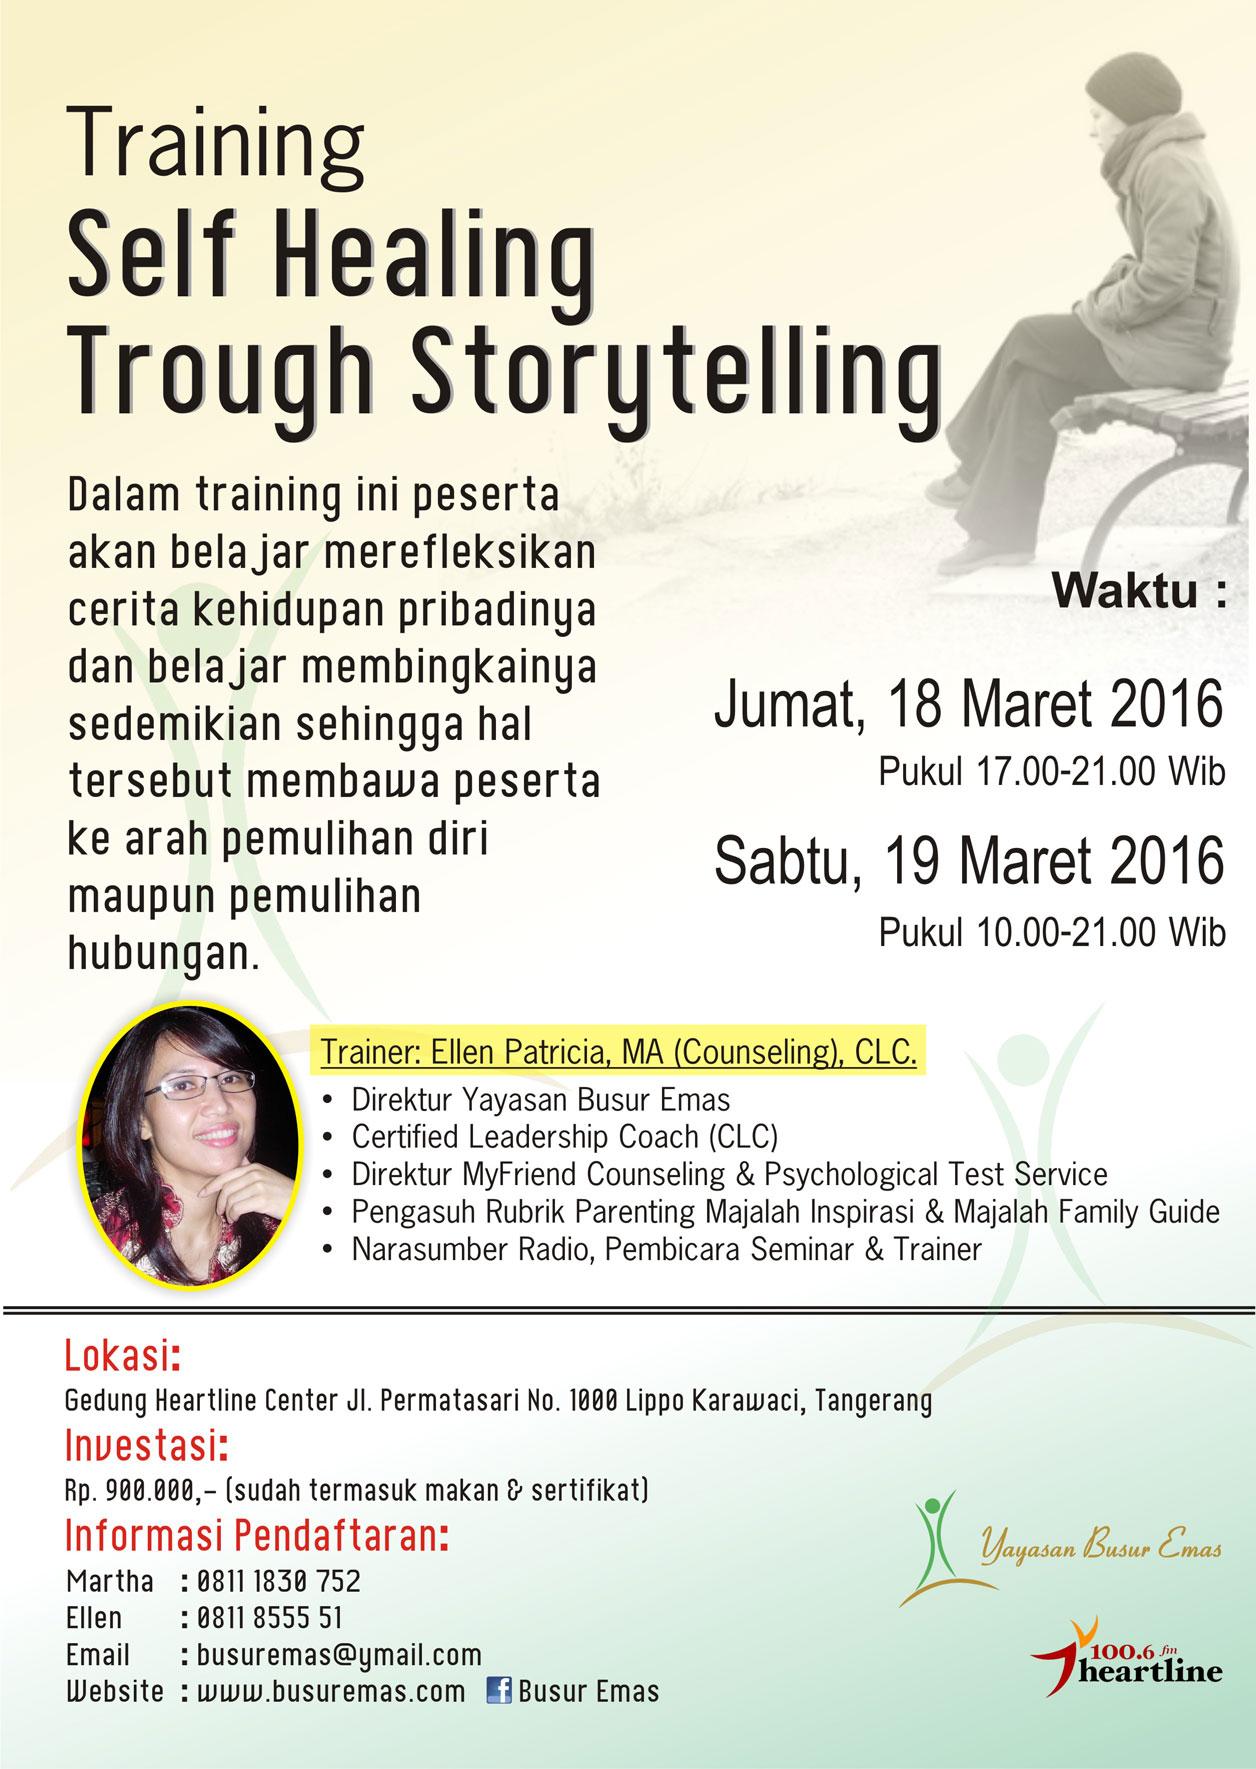 Brosur-Training-Self-Healing-2016-sentuhan-hati2